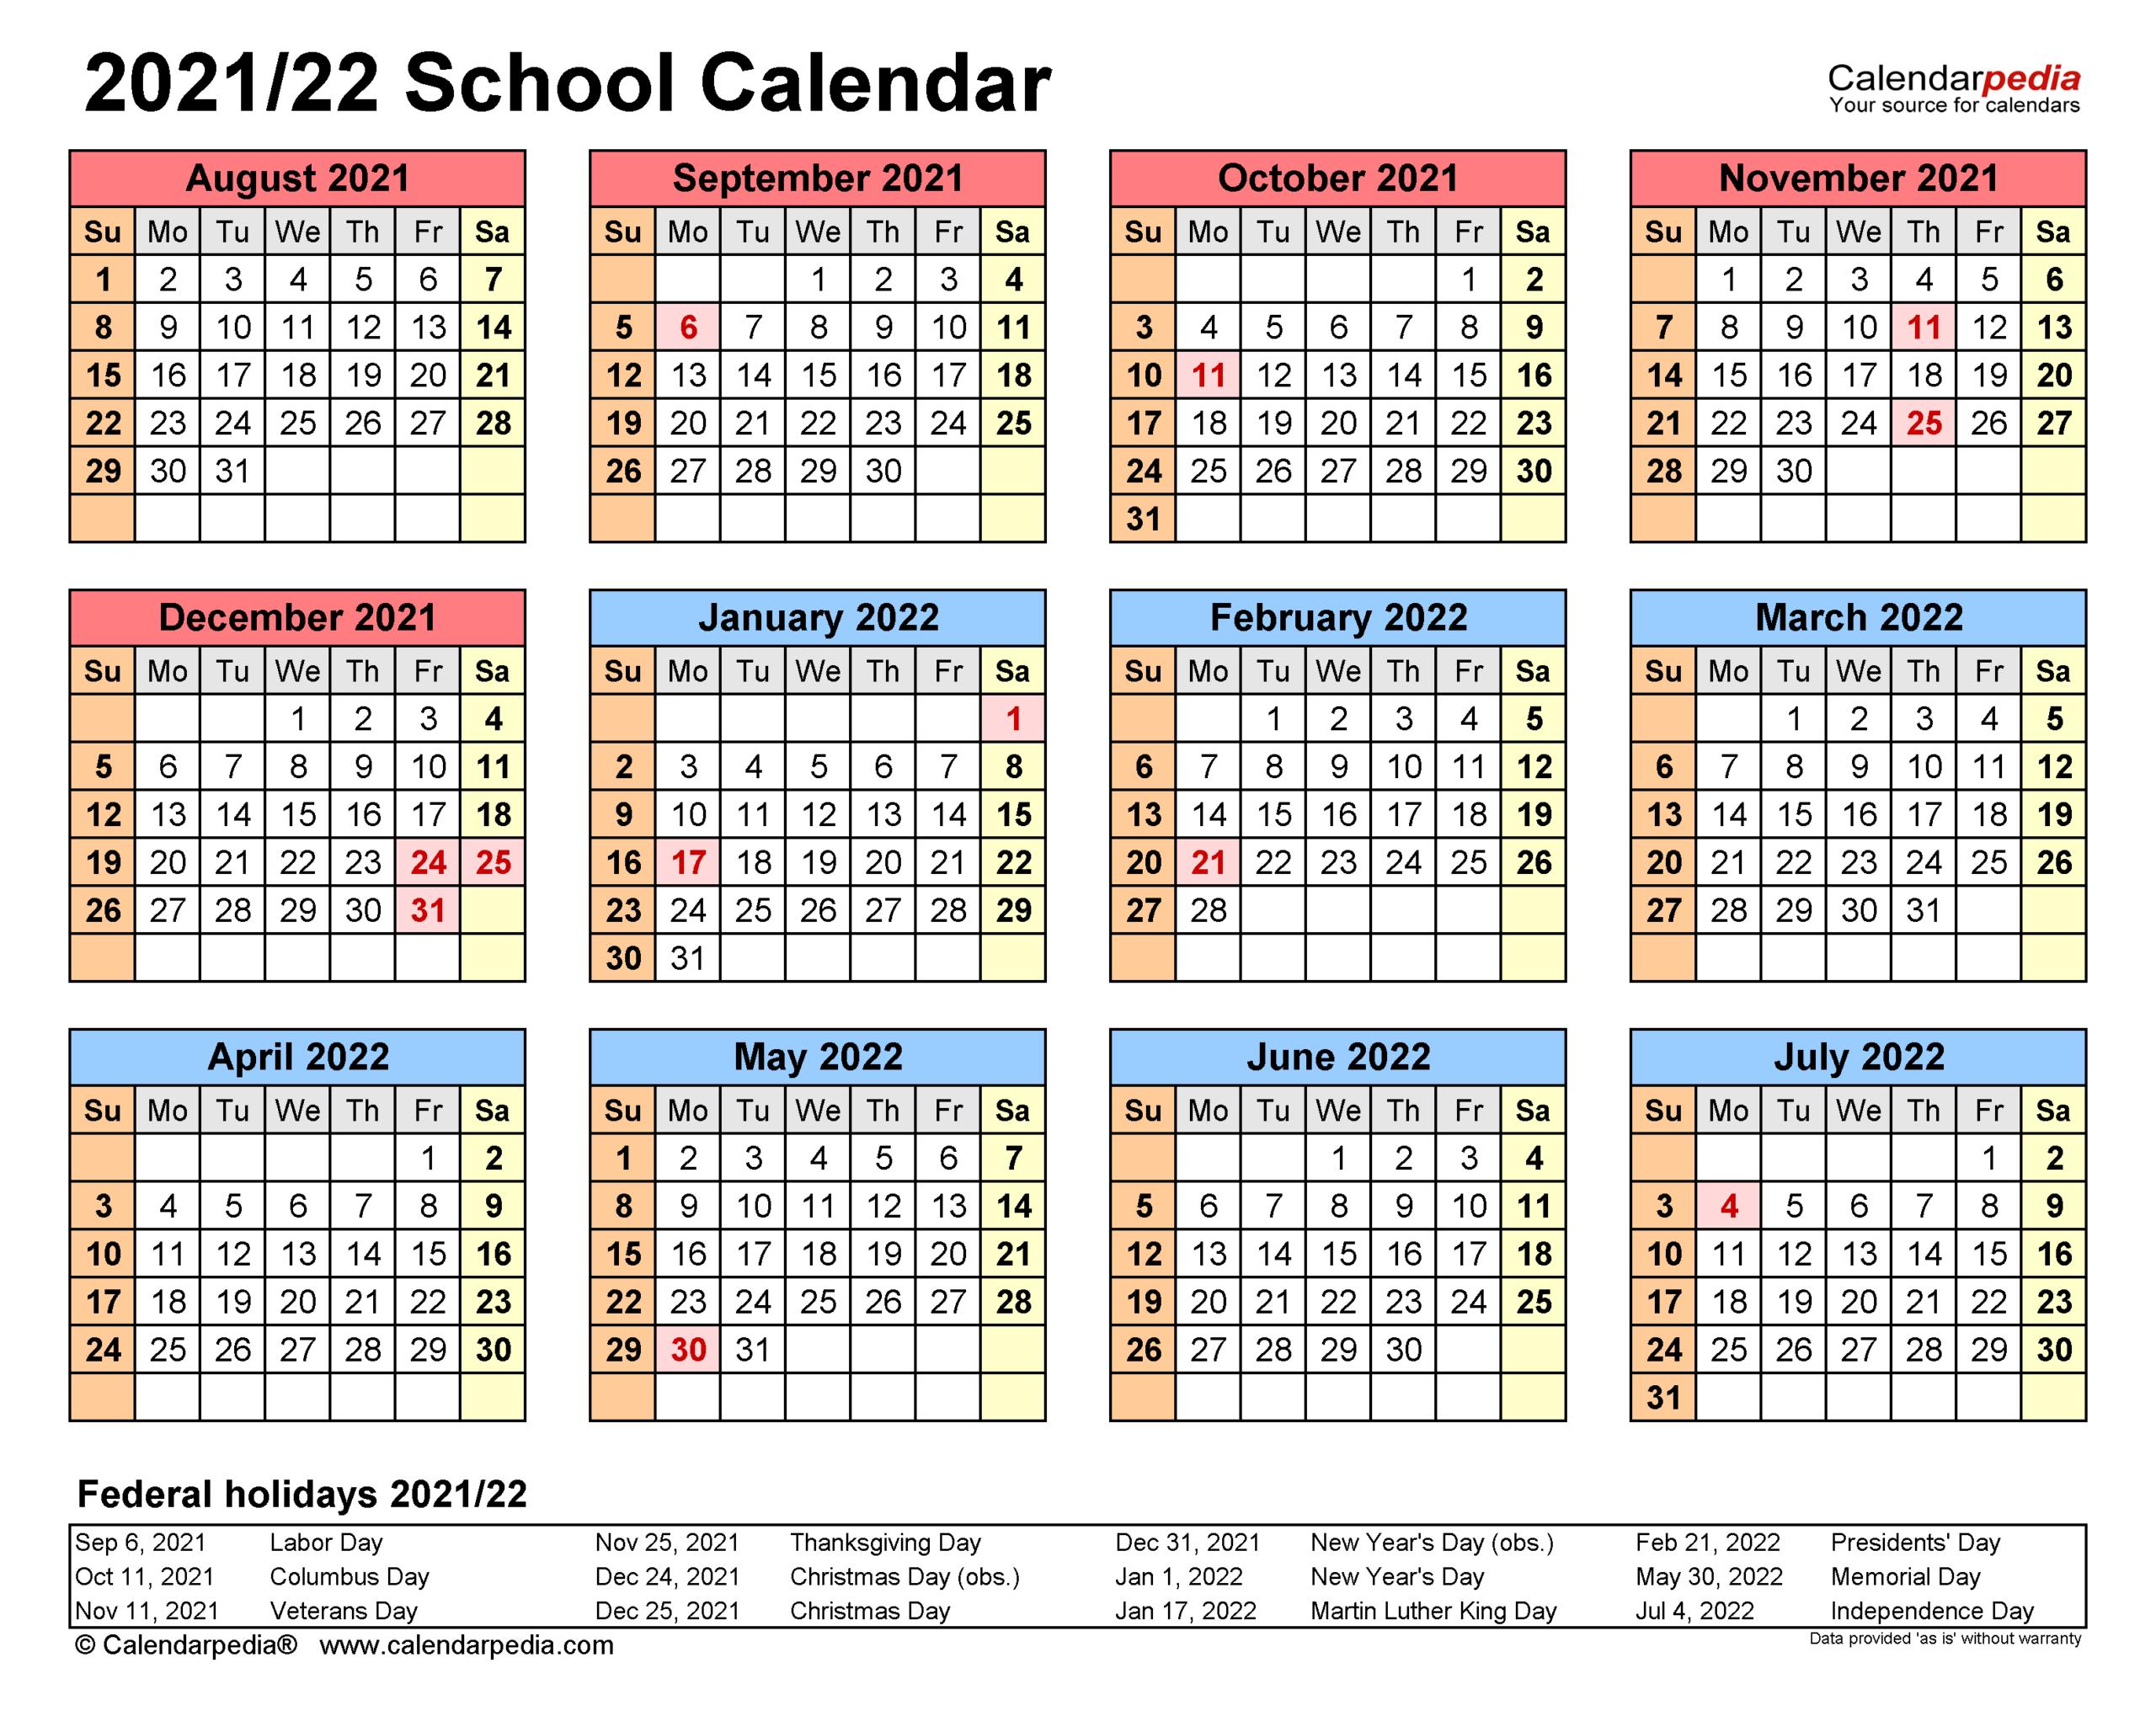 School Calendars 2021/2022 - Free Printable Excel Templates